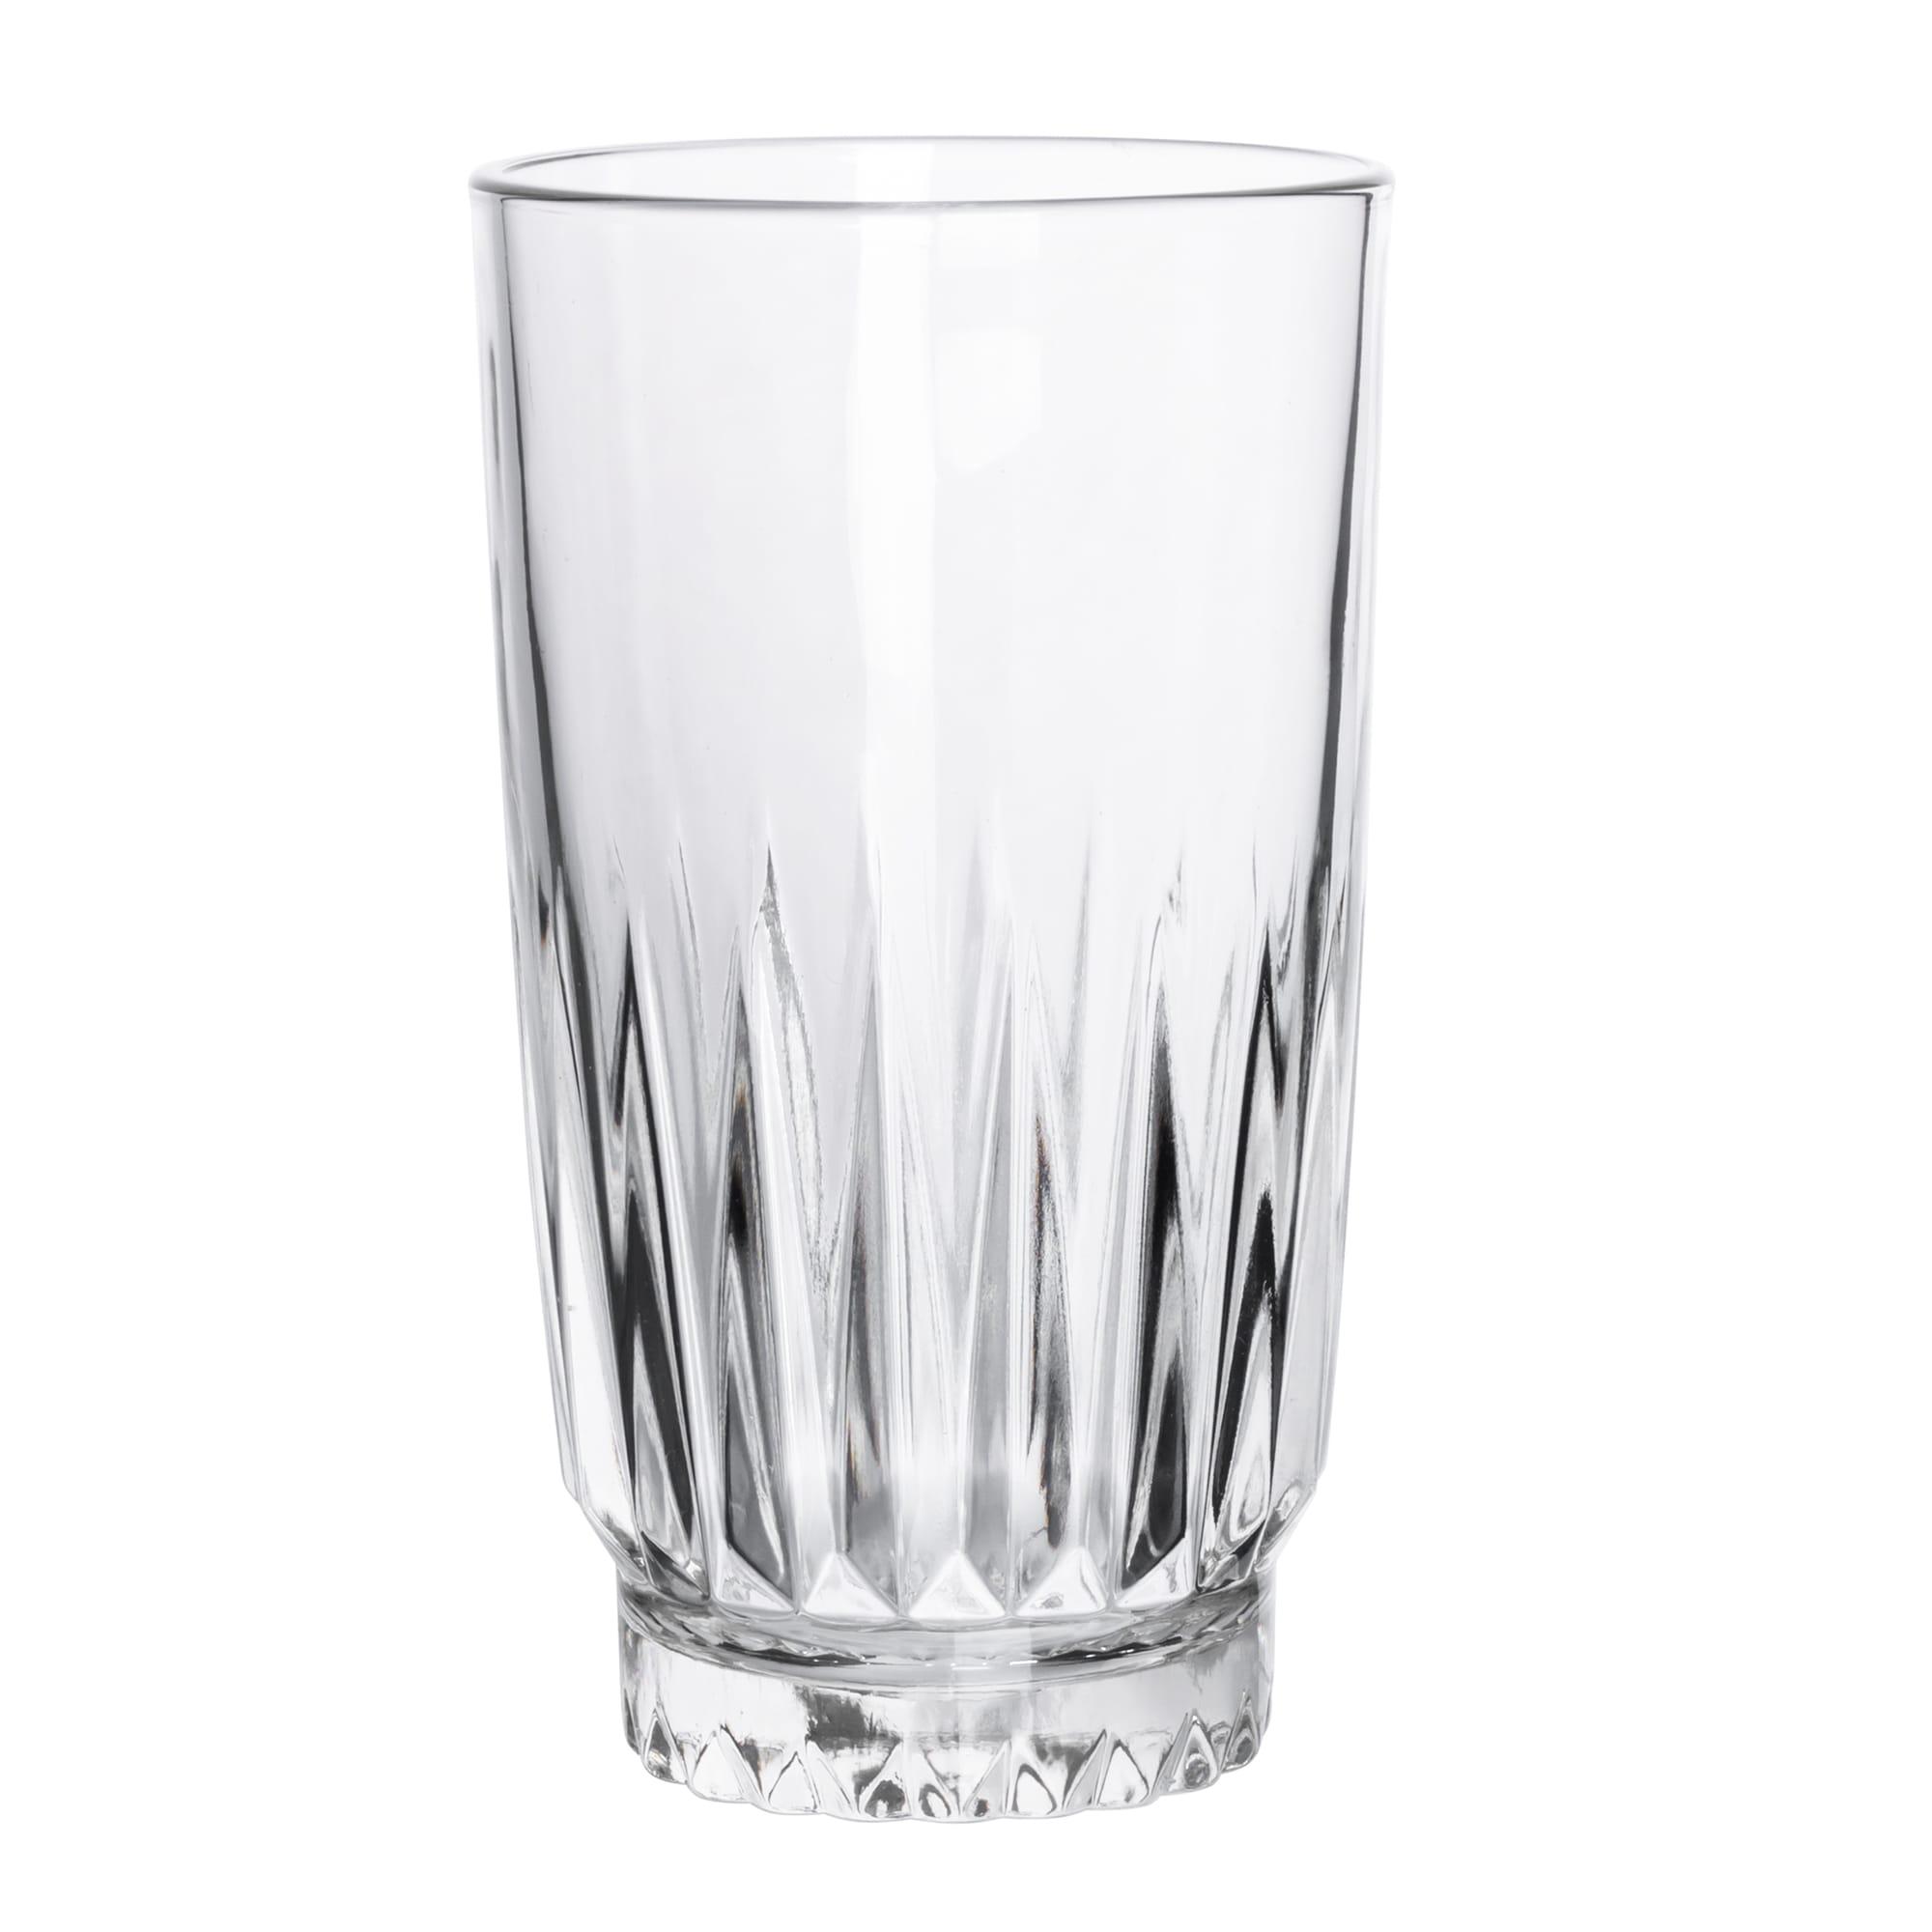 Libbey 15459 16-oz DuraTuff Winchester Cooler Glass